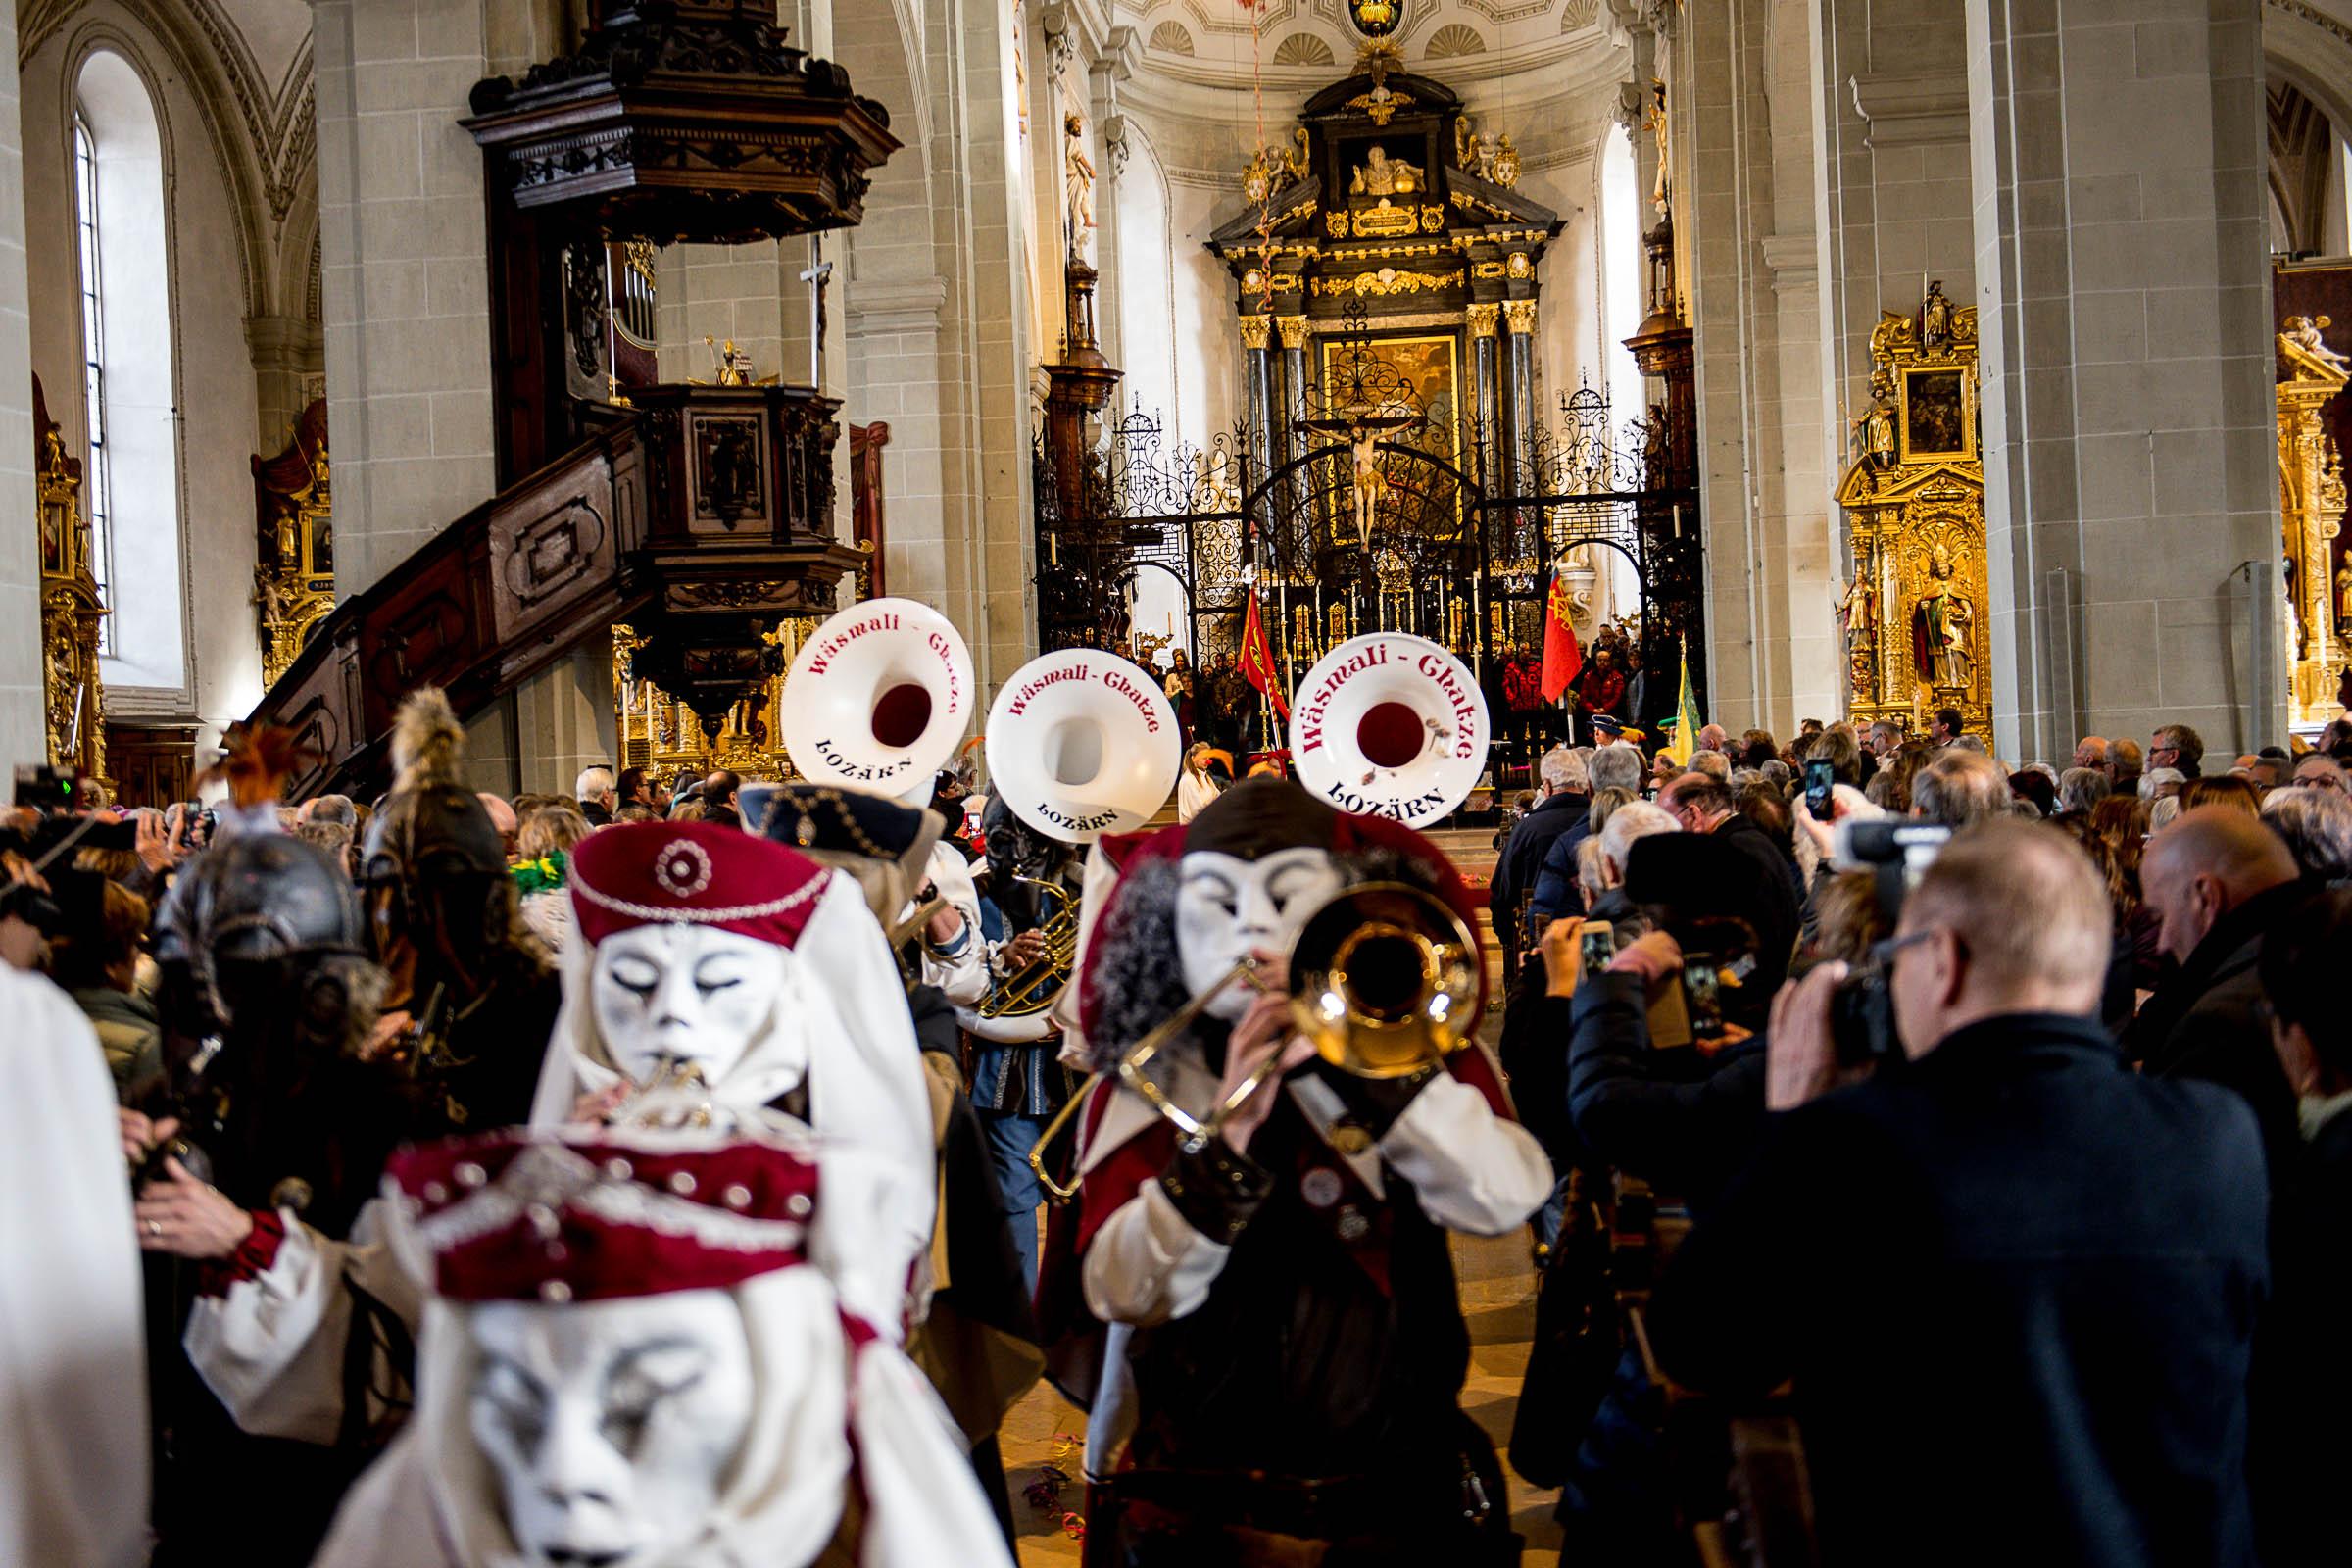 Lätt Göggu übergeben -- Chatzemusig - 70 Johr -- 2 Gugger-Mässen am Sonntag